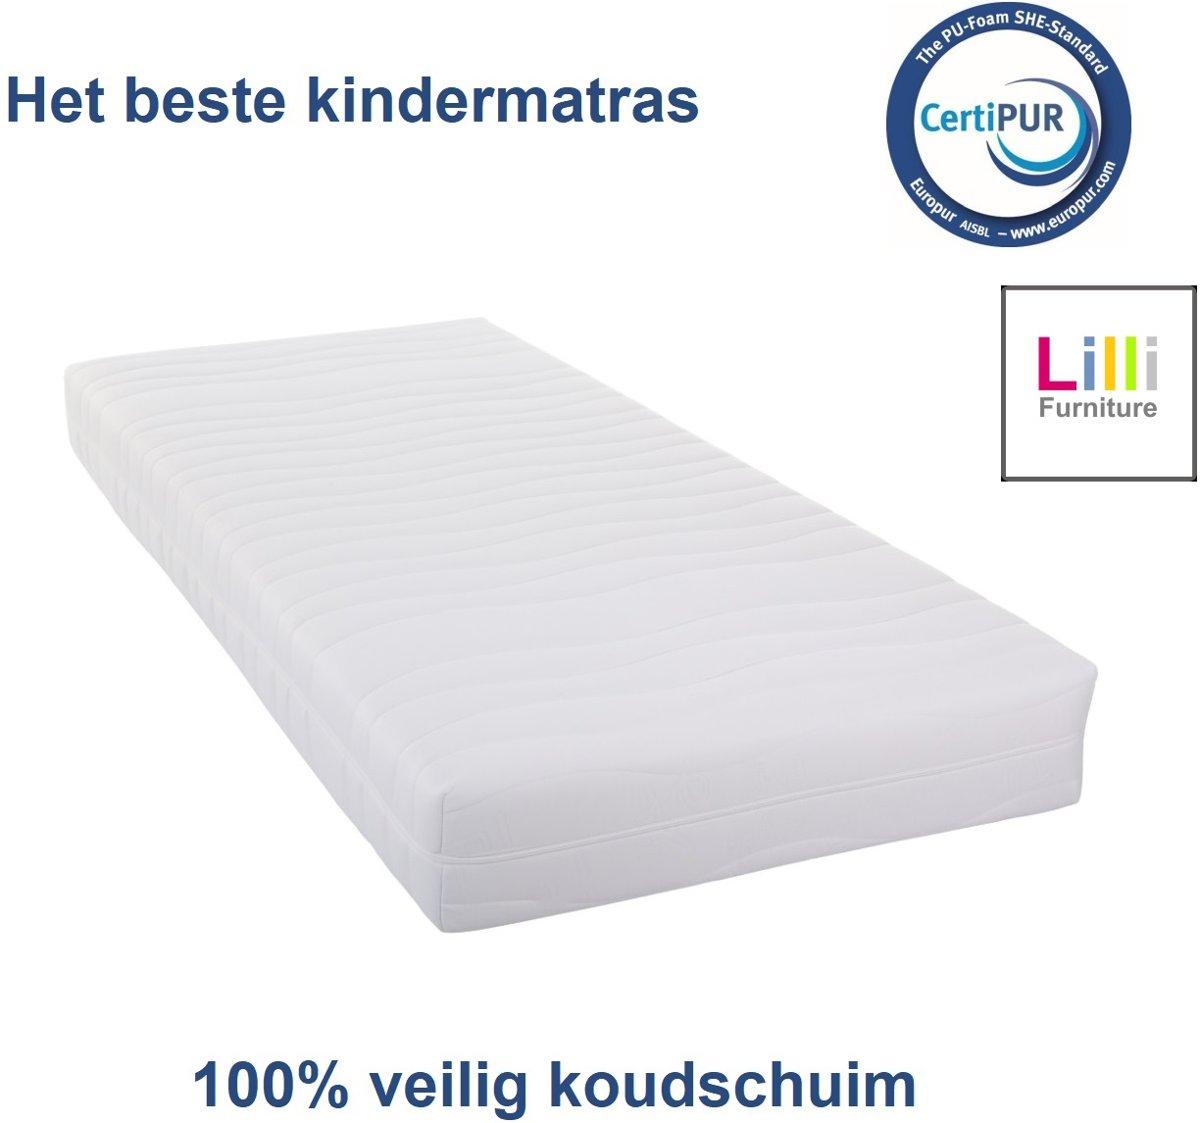 Lilli Furniture HR40 70x150 matras kopen